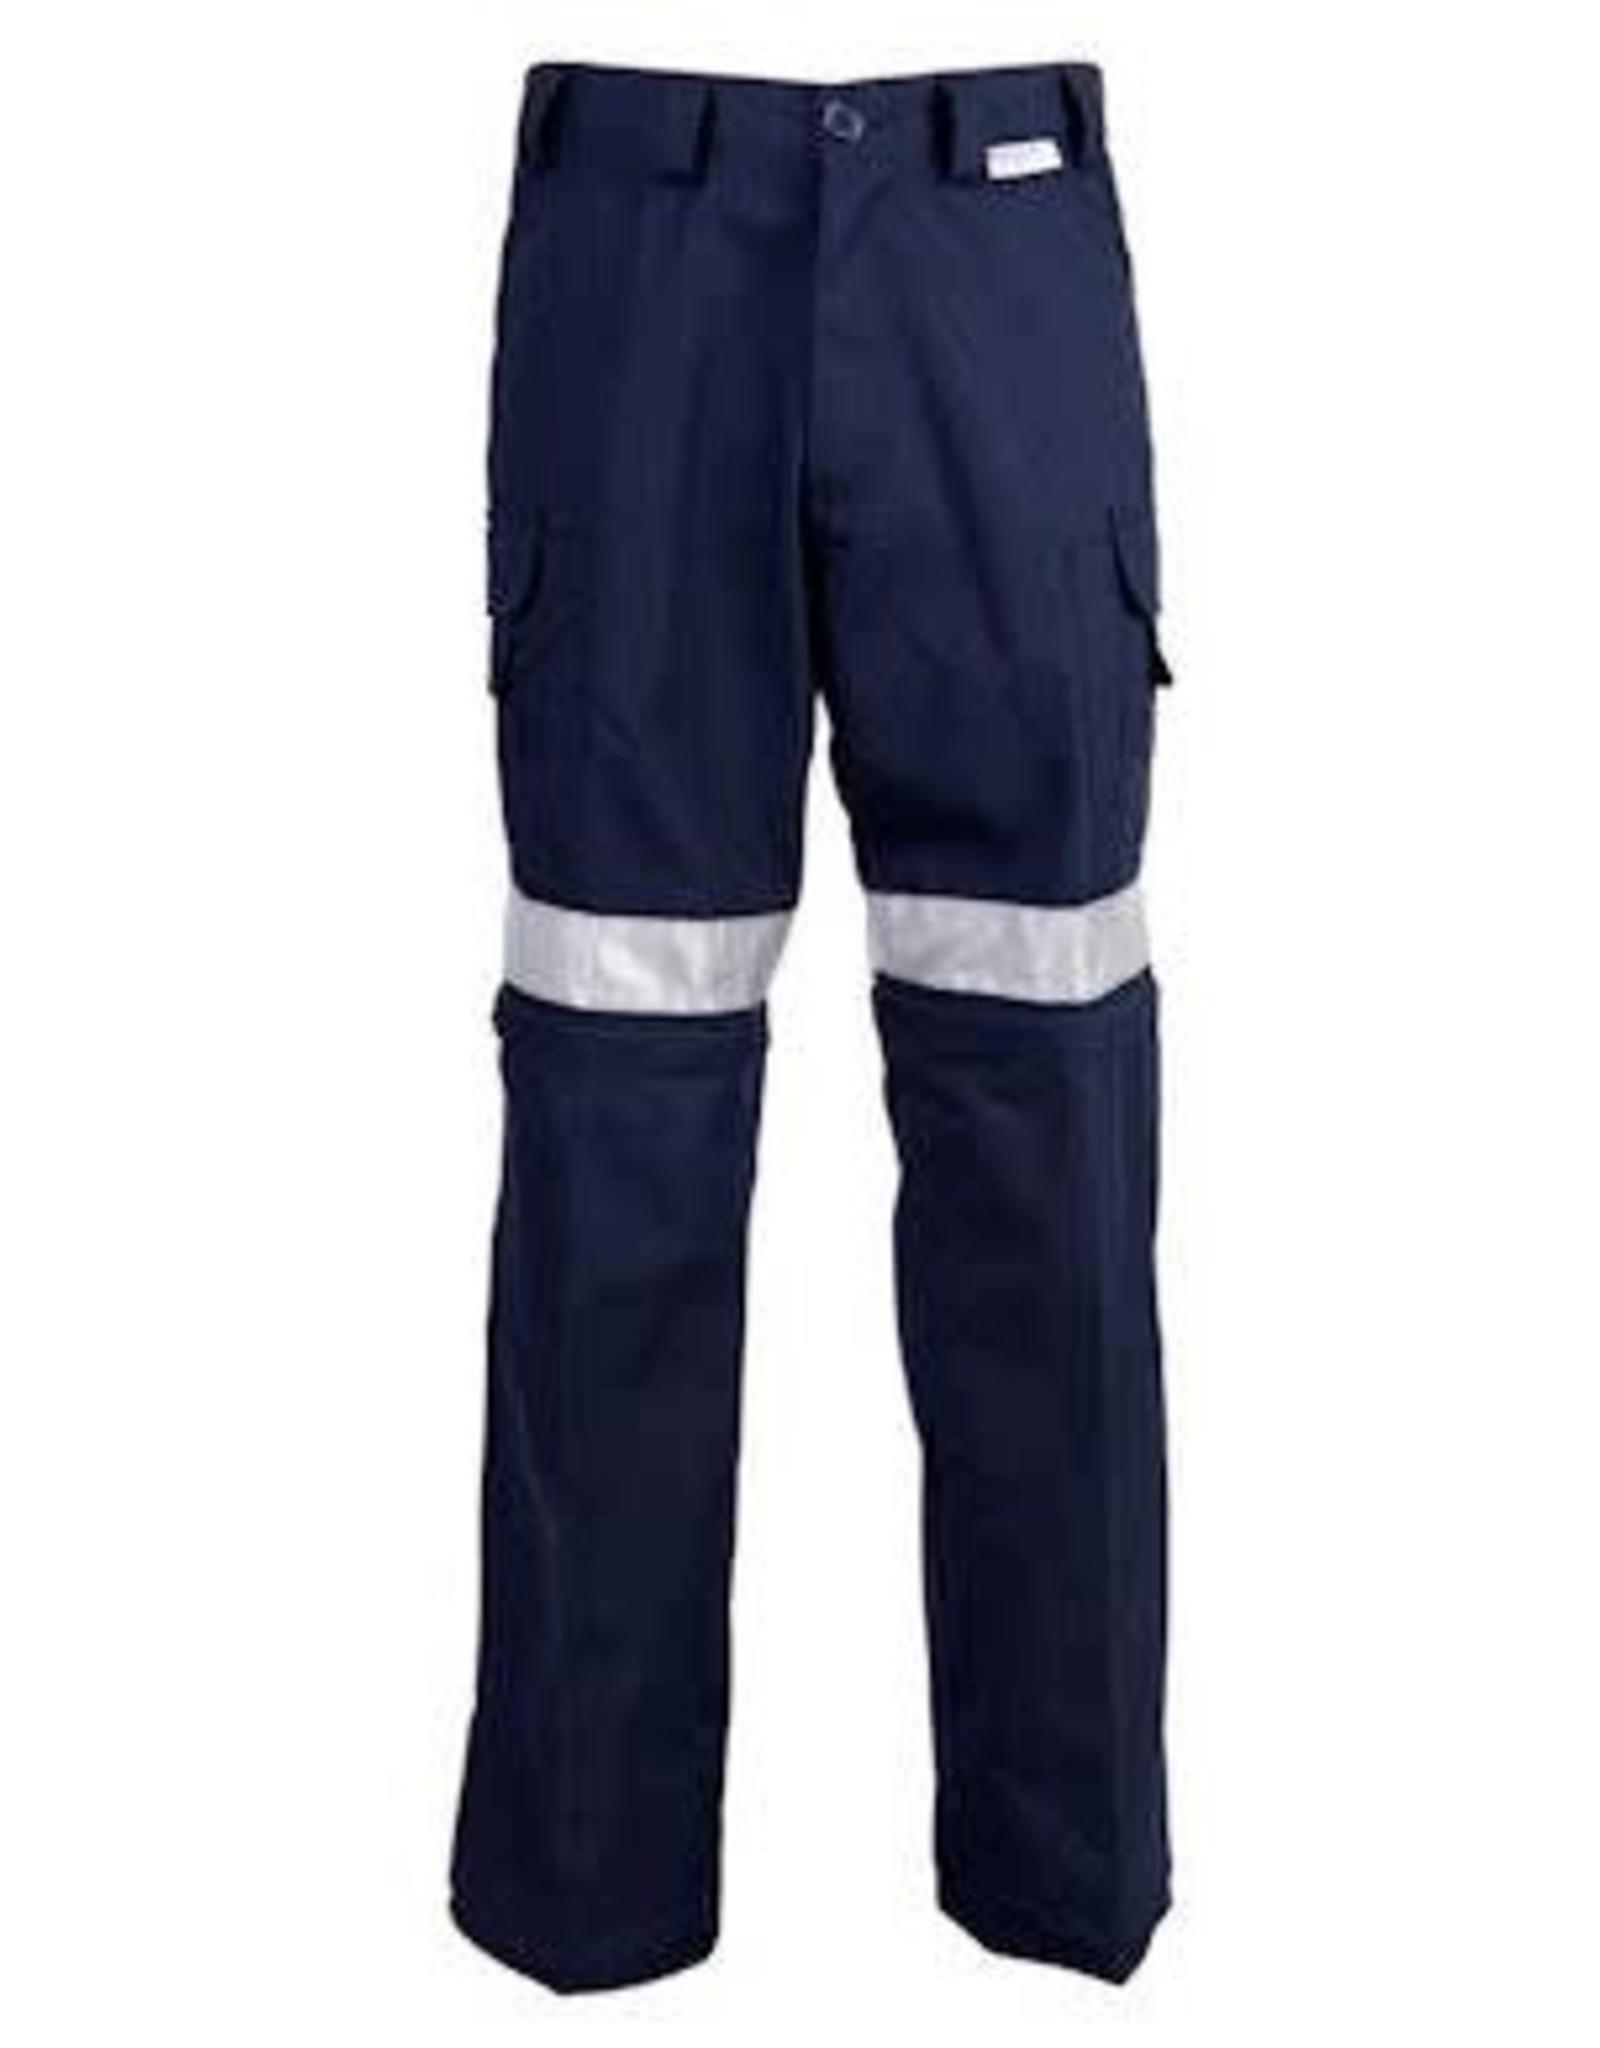 Coolworks Work Pants